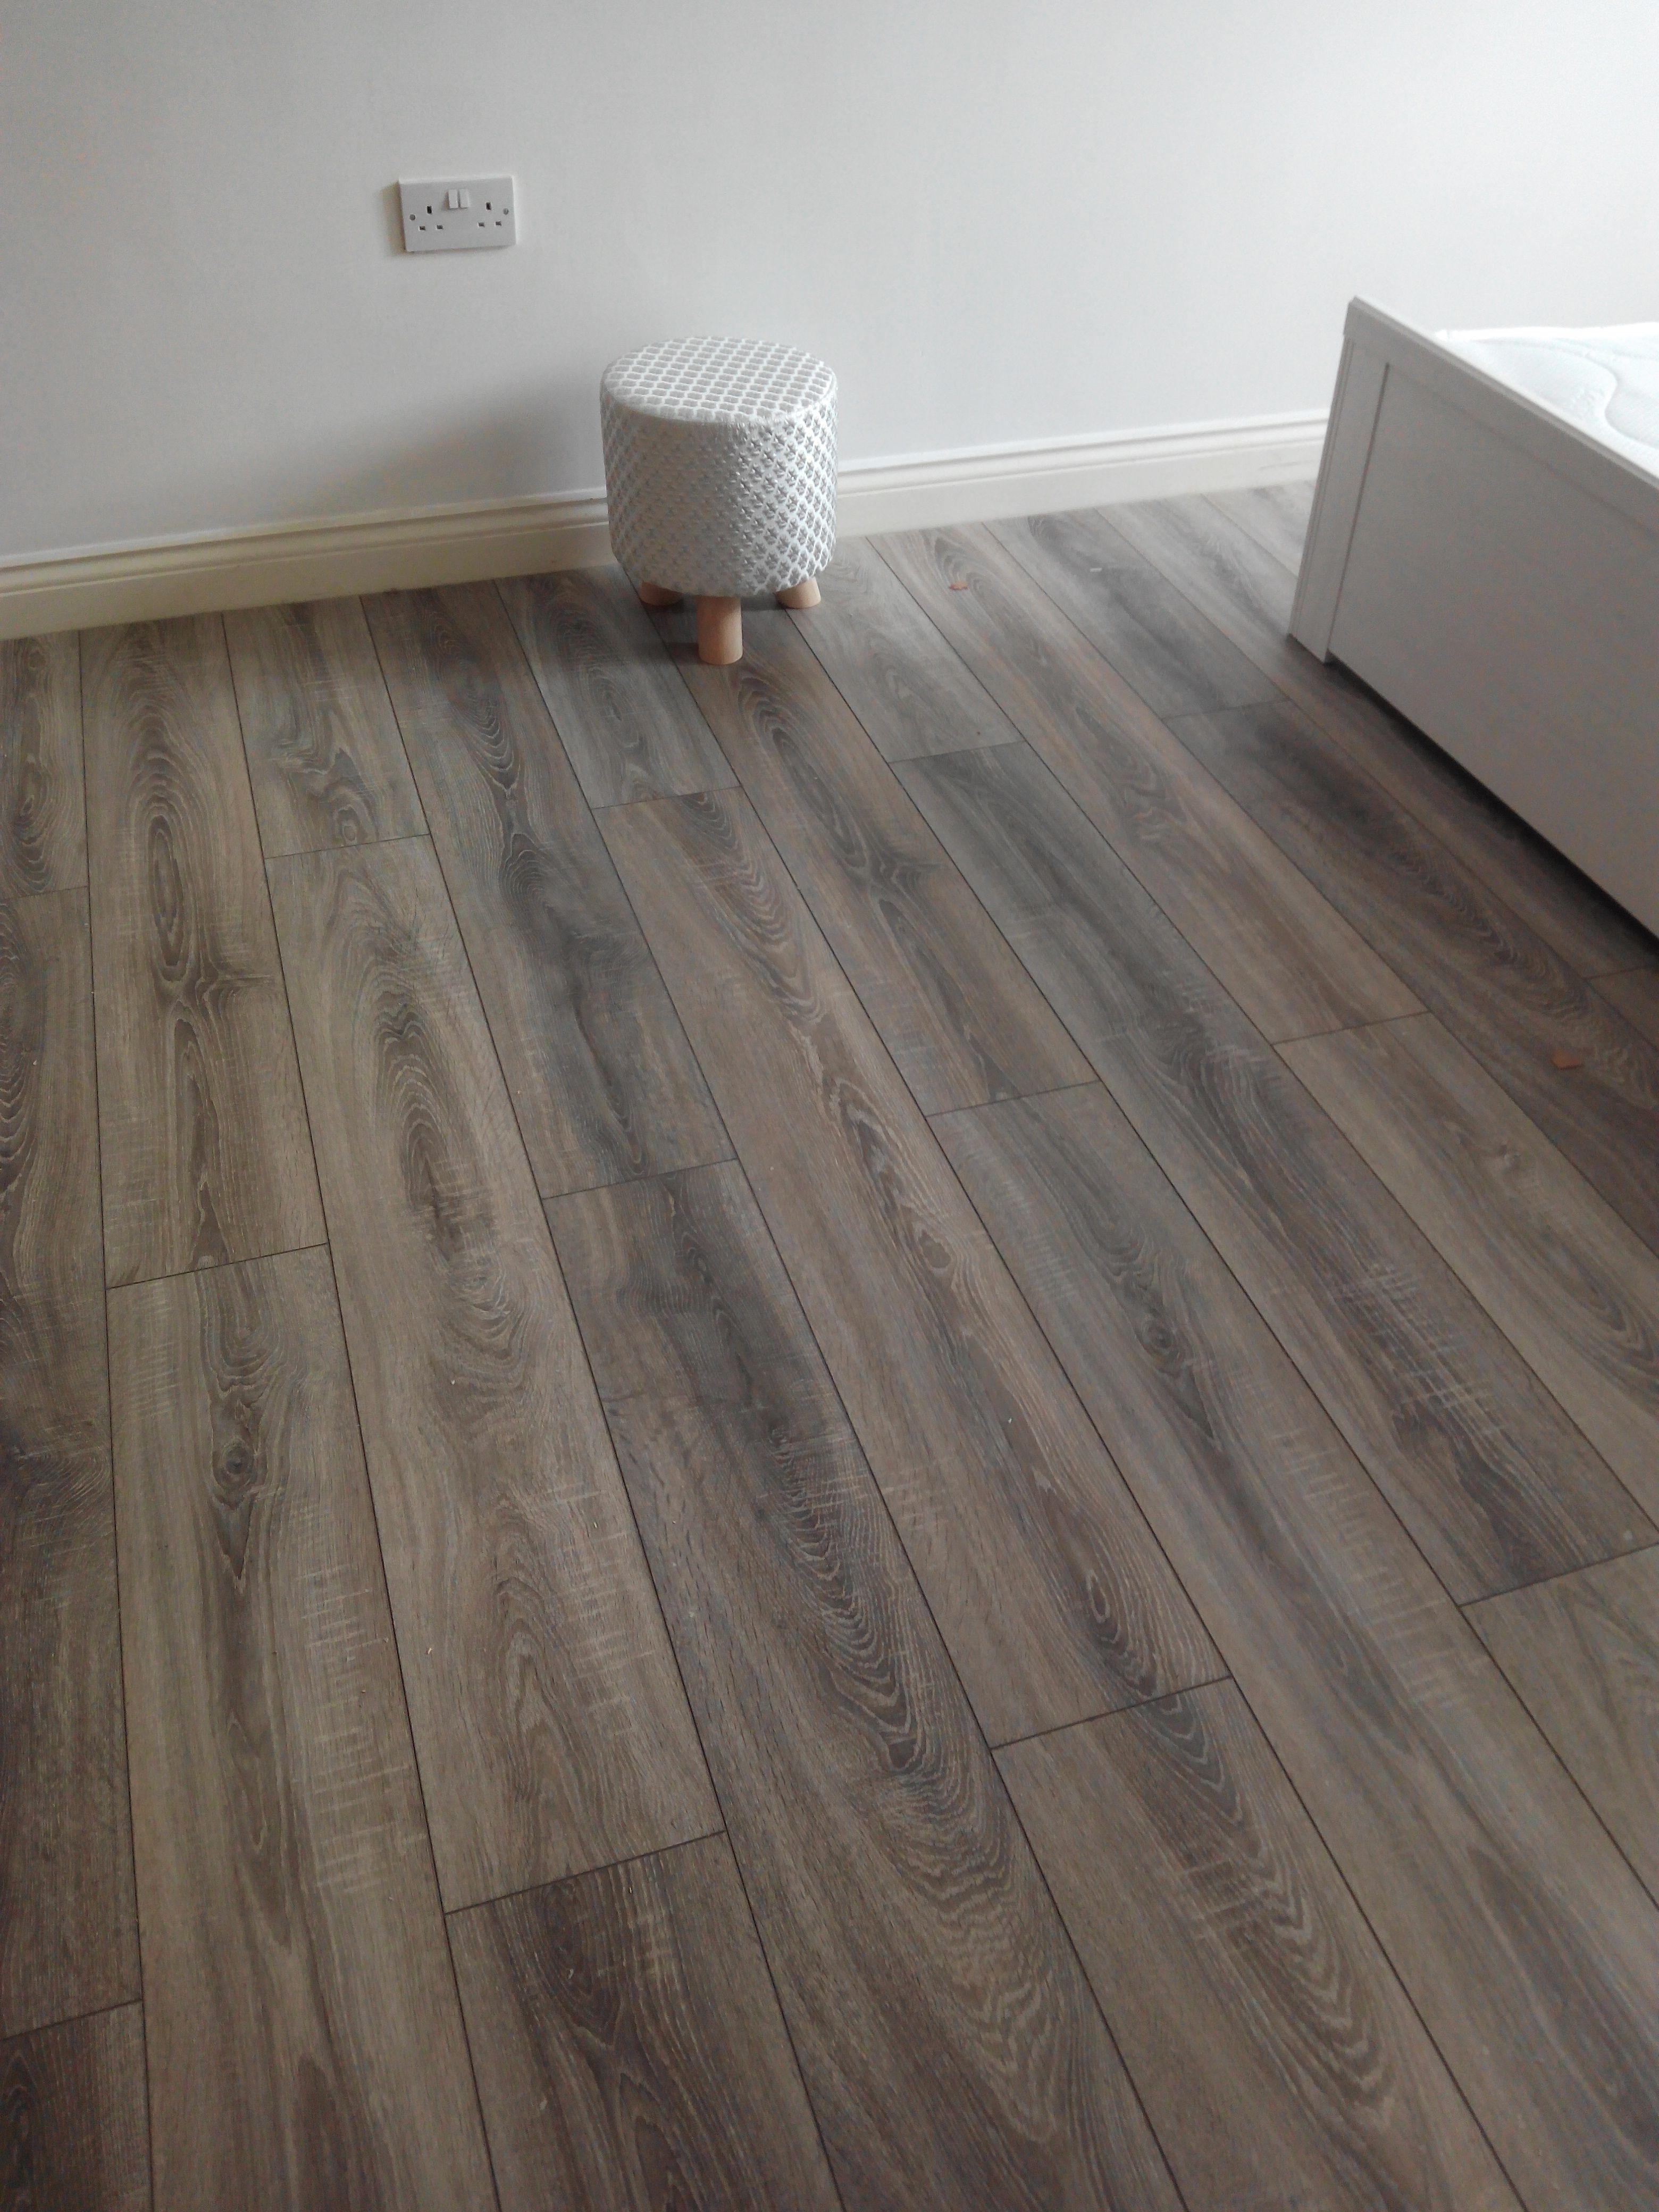 Sydney 7mm Laminate Flooring Grey Oak Grey laminate